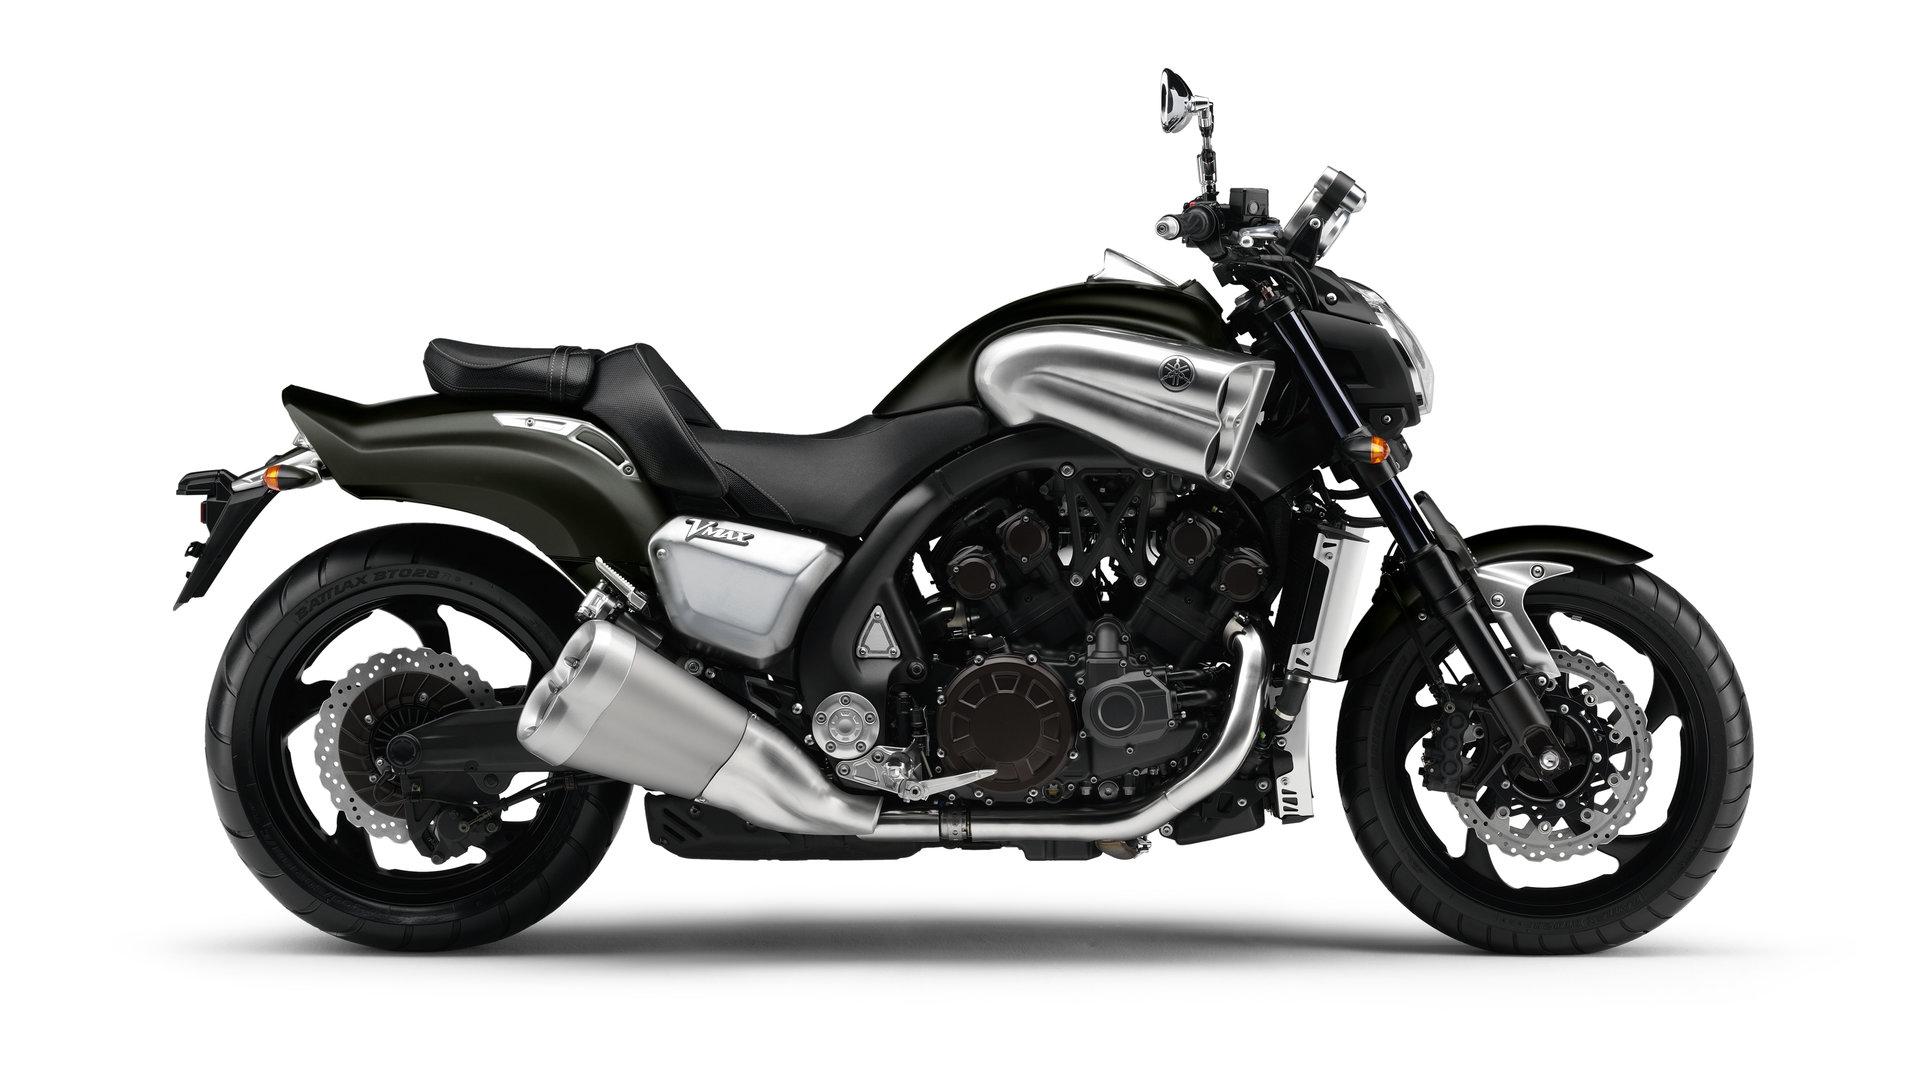 Yamaha VMAX 1700 2013